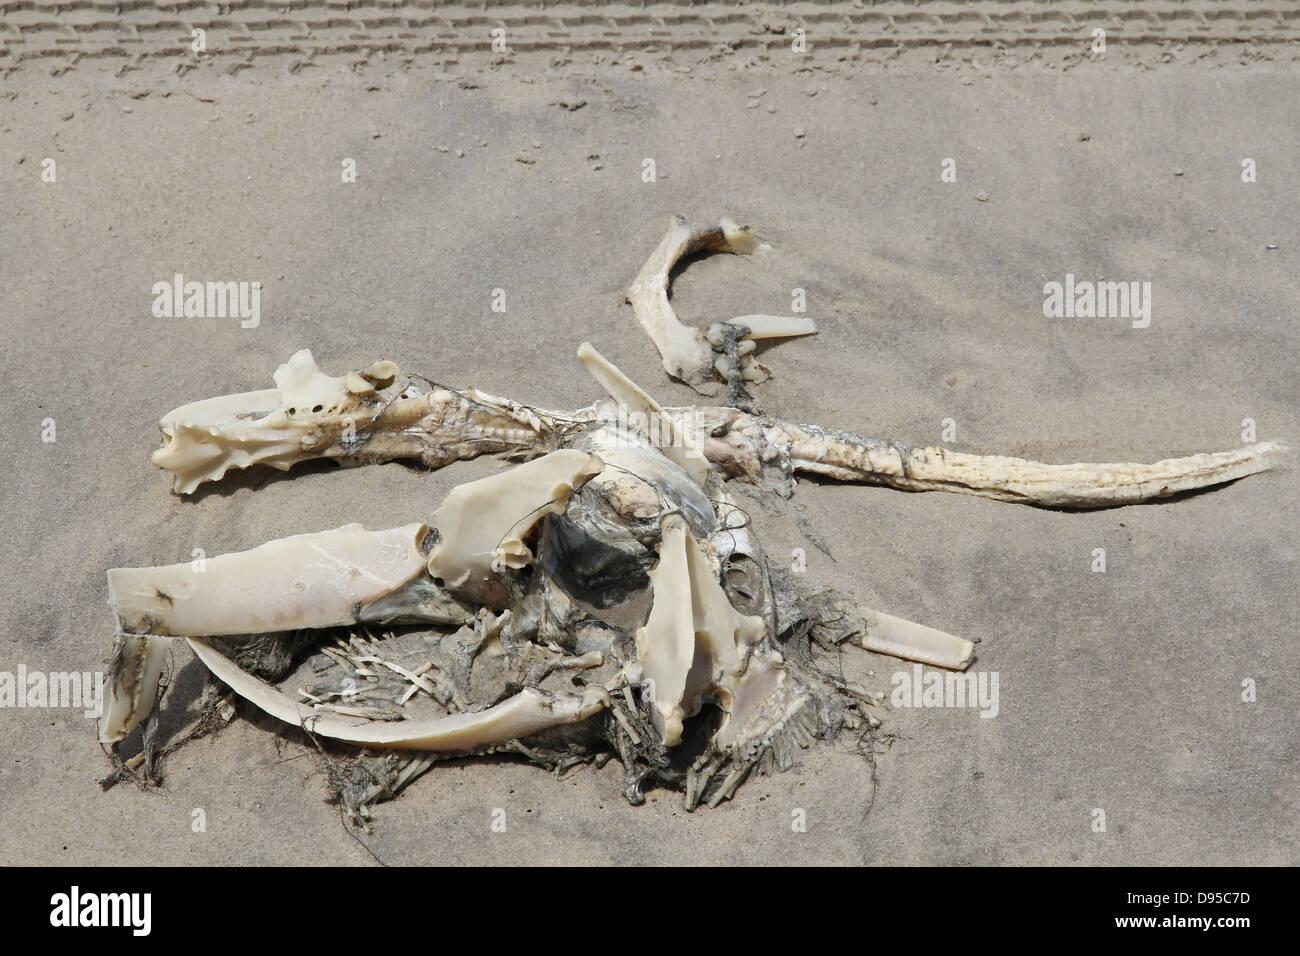 Pile Of Bones Stock Photos & Pile Of Bones Stock Images ...